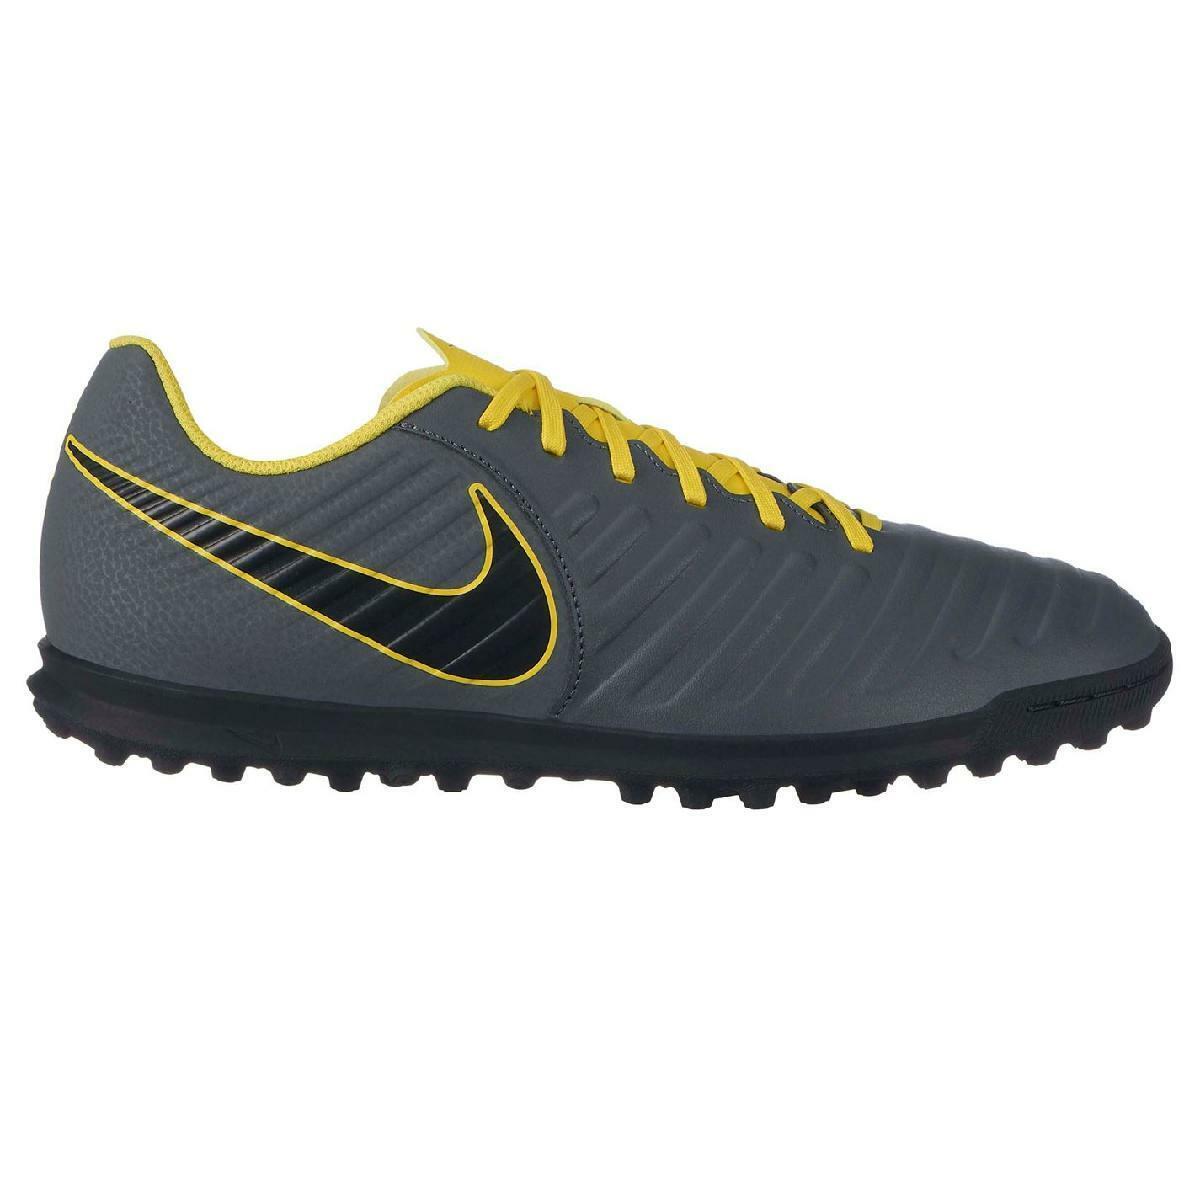 Nike Nike Nike Tiempo Legend Club Fussballschuhe Herren AT Astro Turf Kunstrasen Fußball 2 e3435a